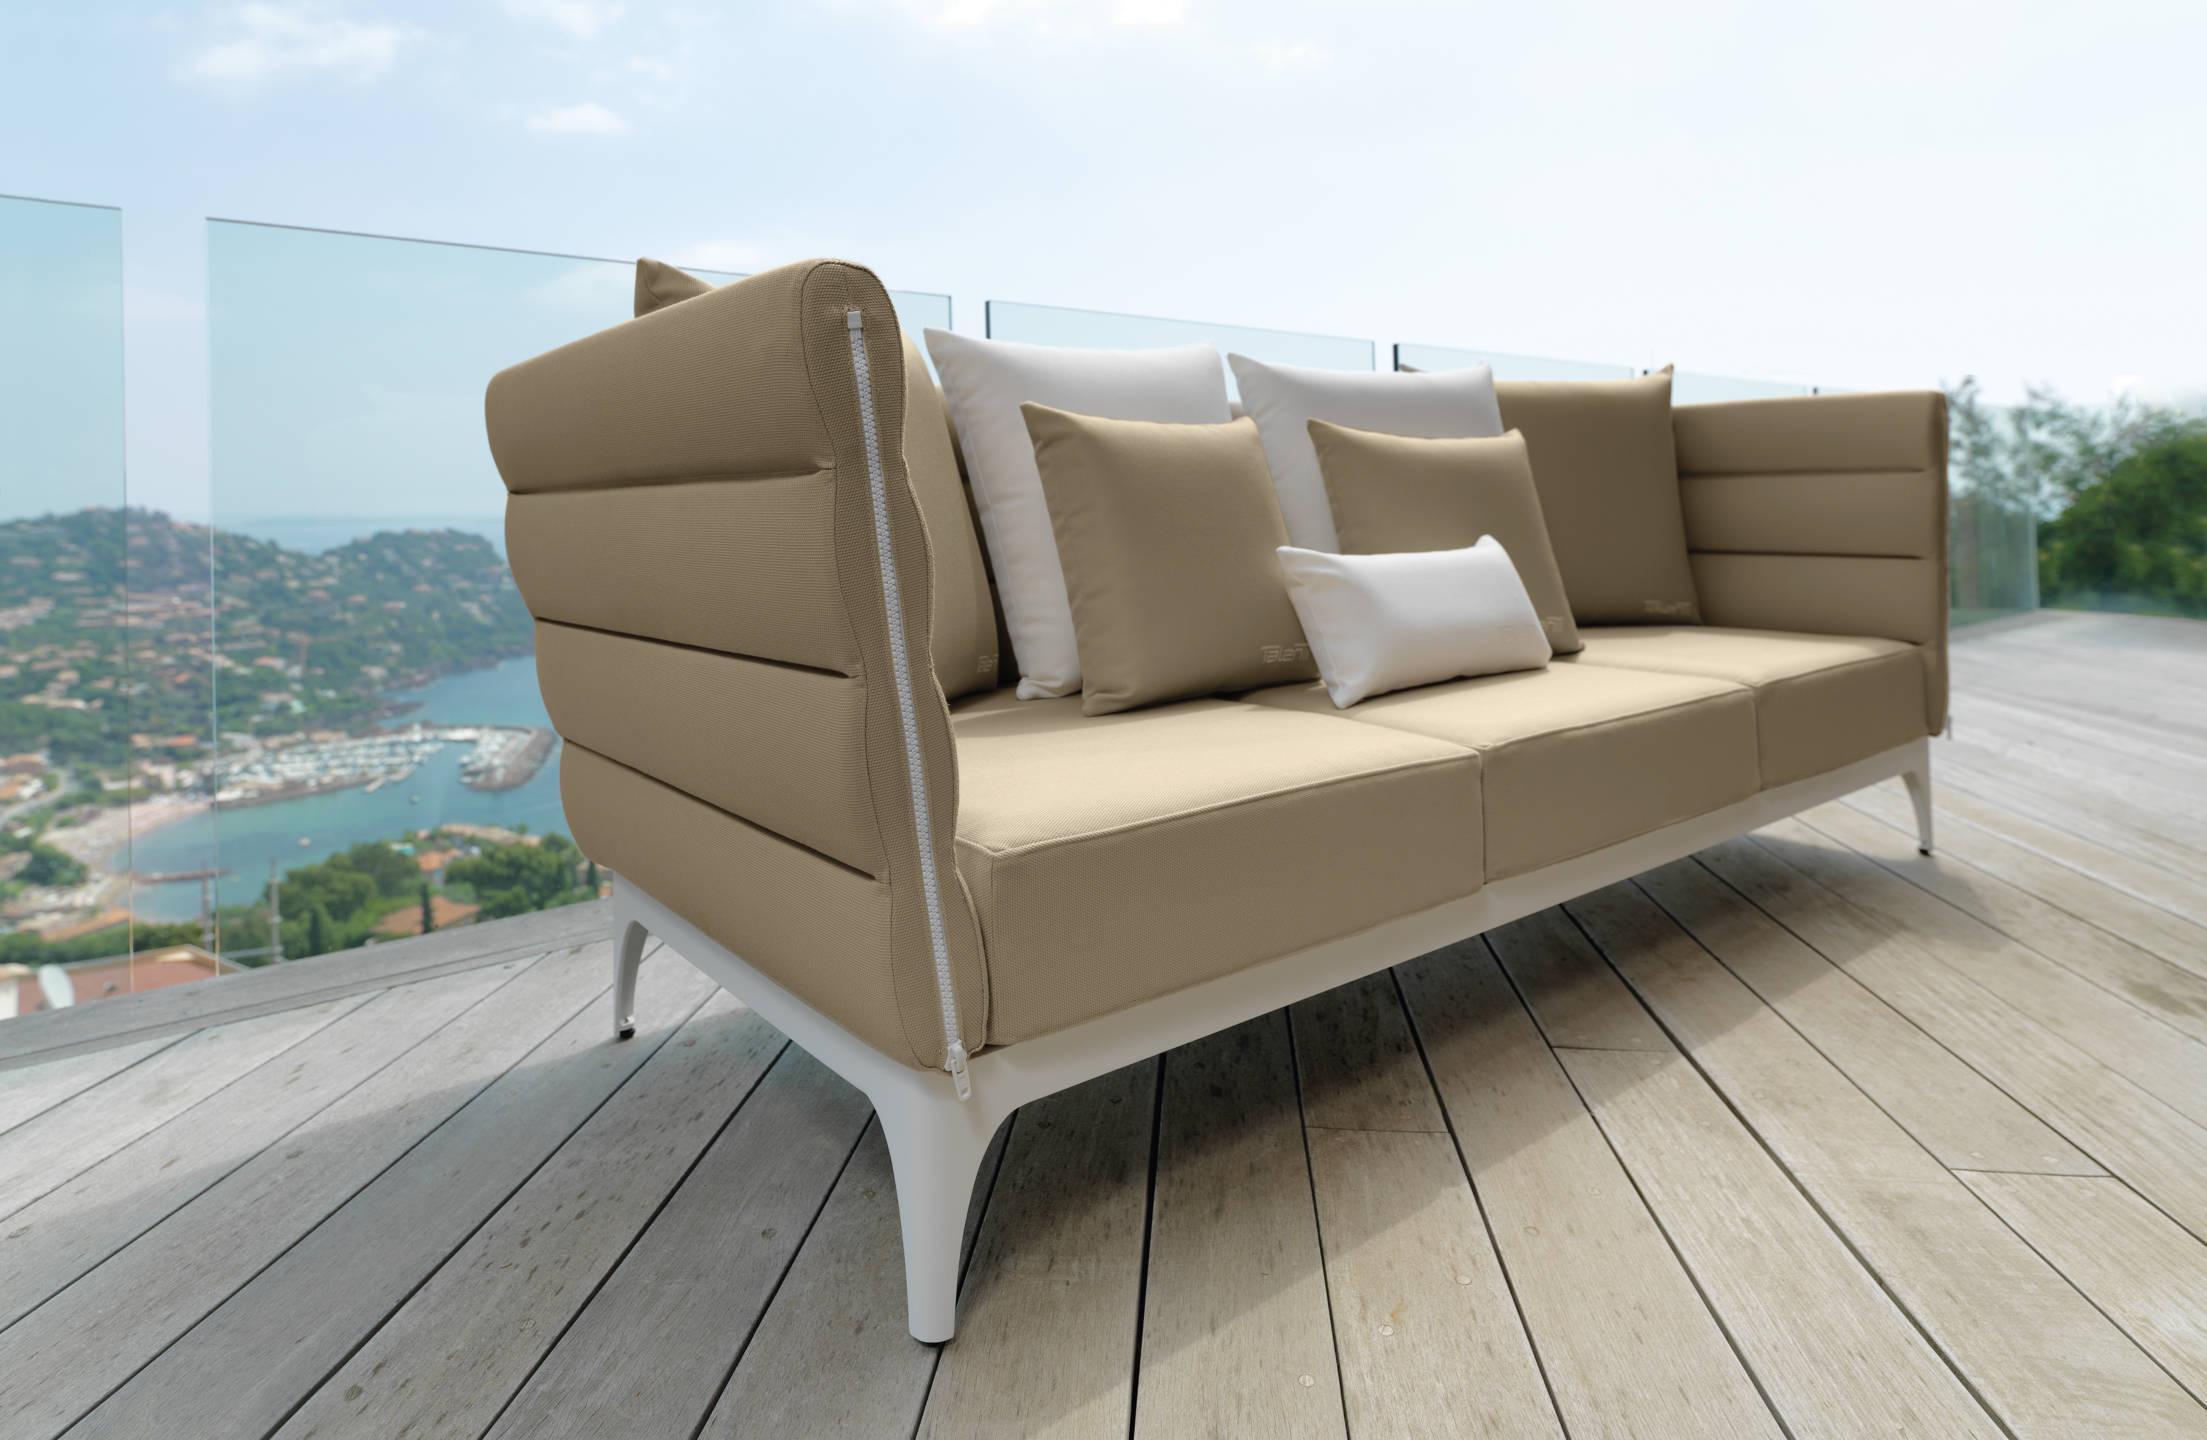 Vivereverde divano padcollection divani per esterno for Divani outdoor outlet